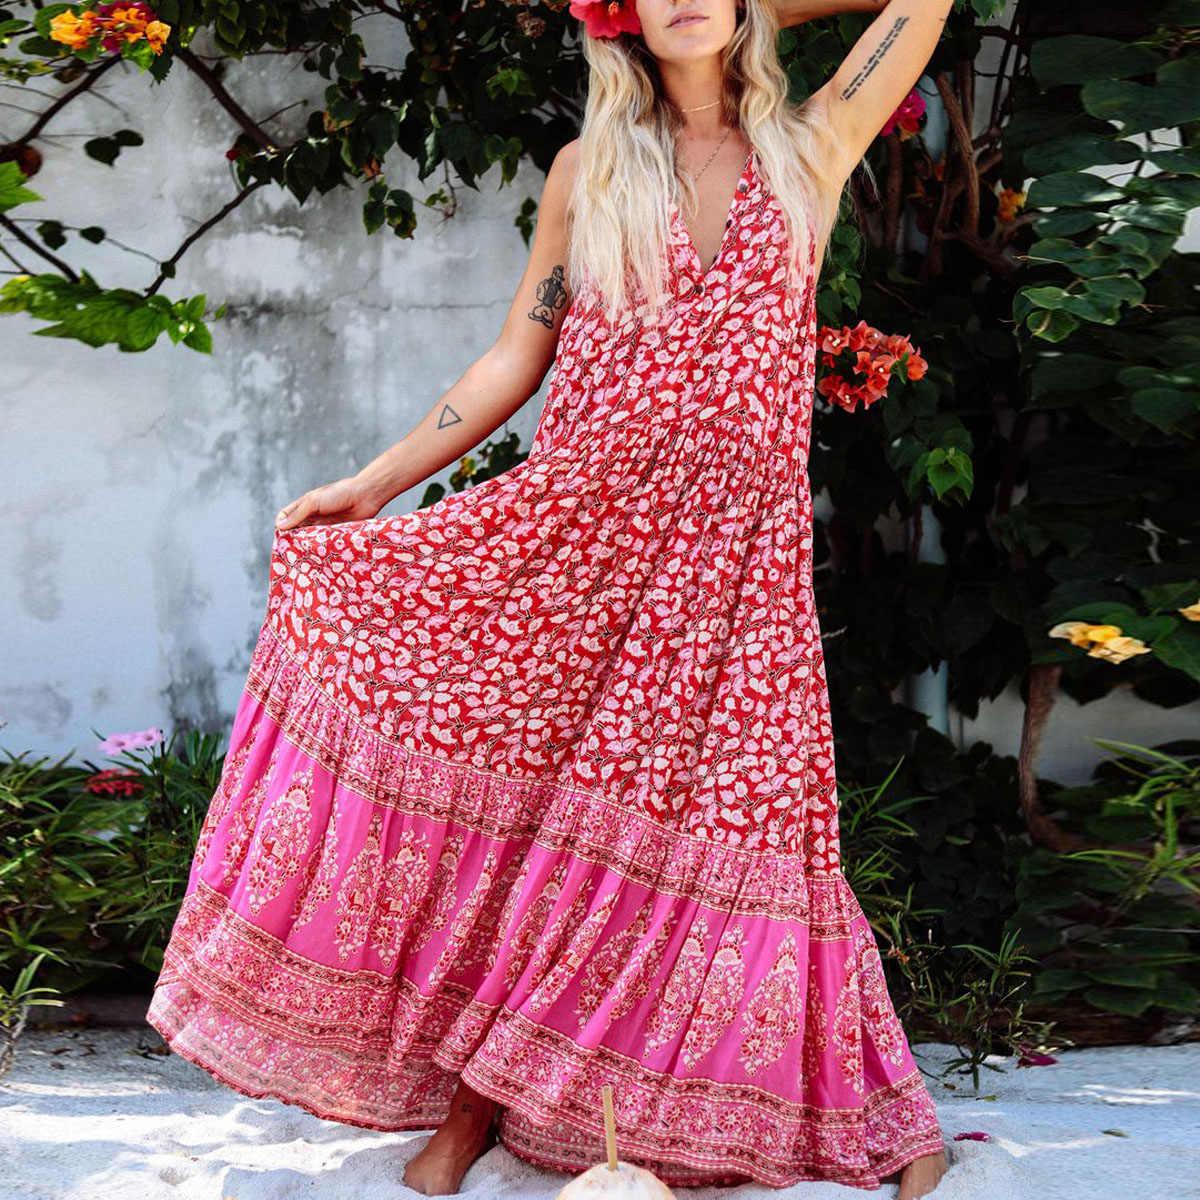 f9fc34470aac ... Red Print Women Dress Boho Hippie Chic Beach Dresses V-Neck Sleeveless Summer  Dress Flowy ...